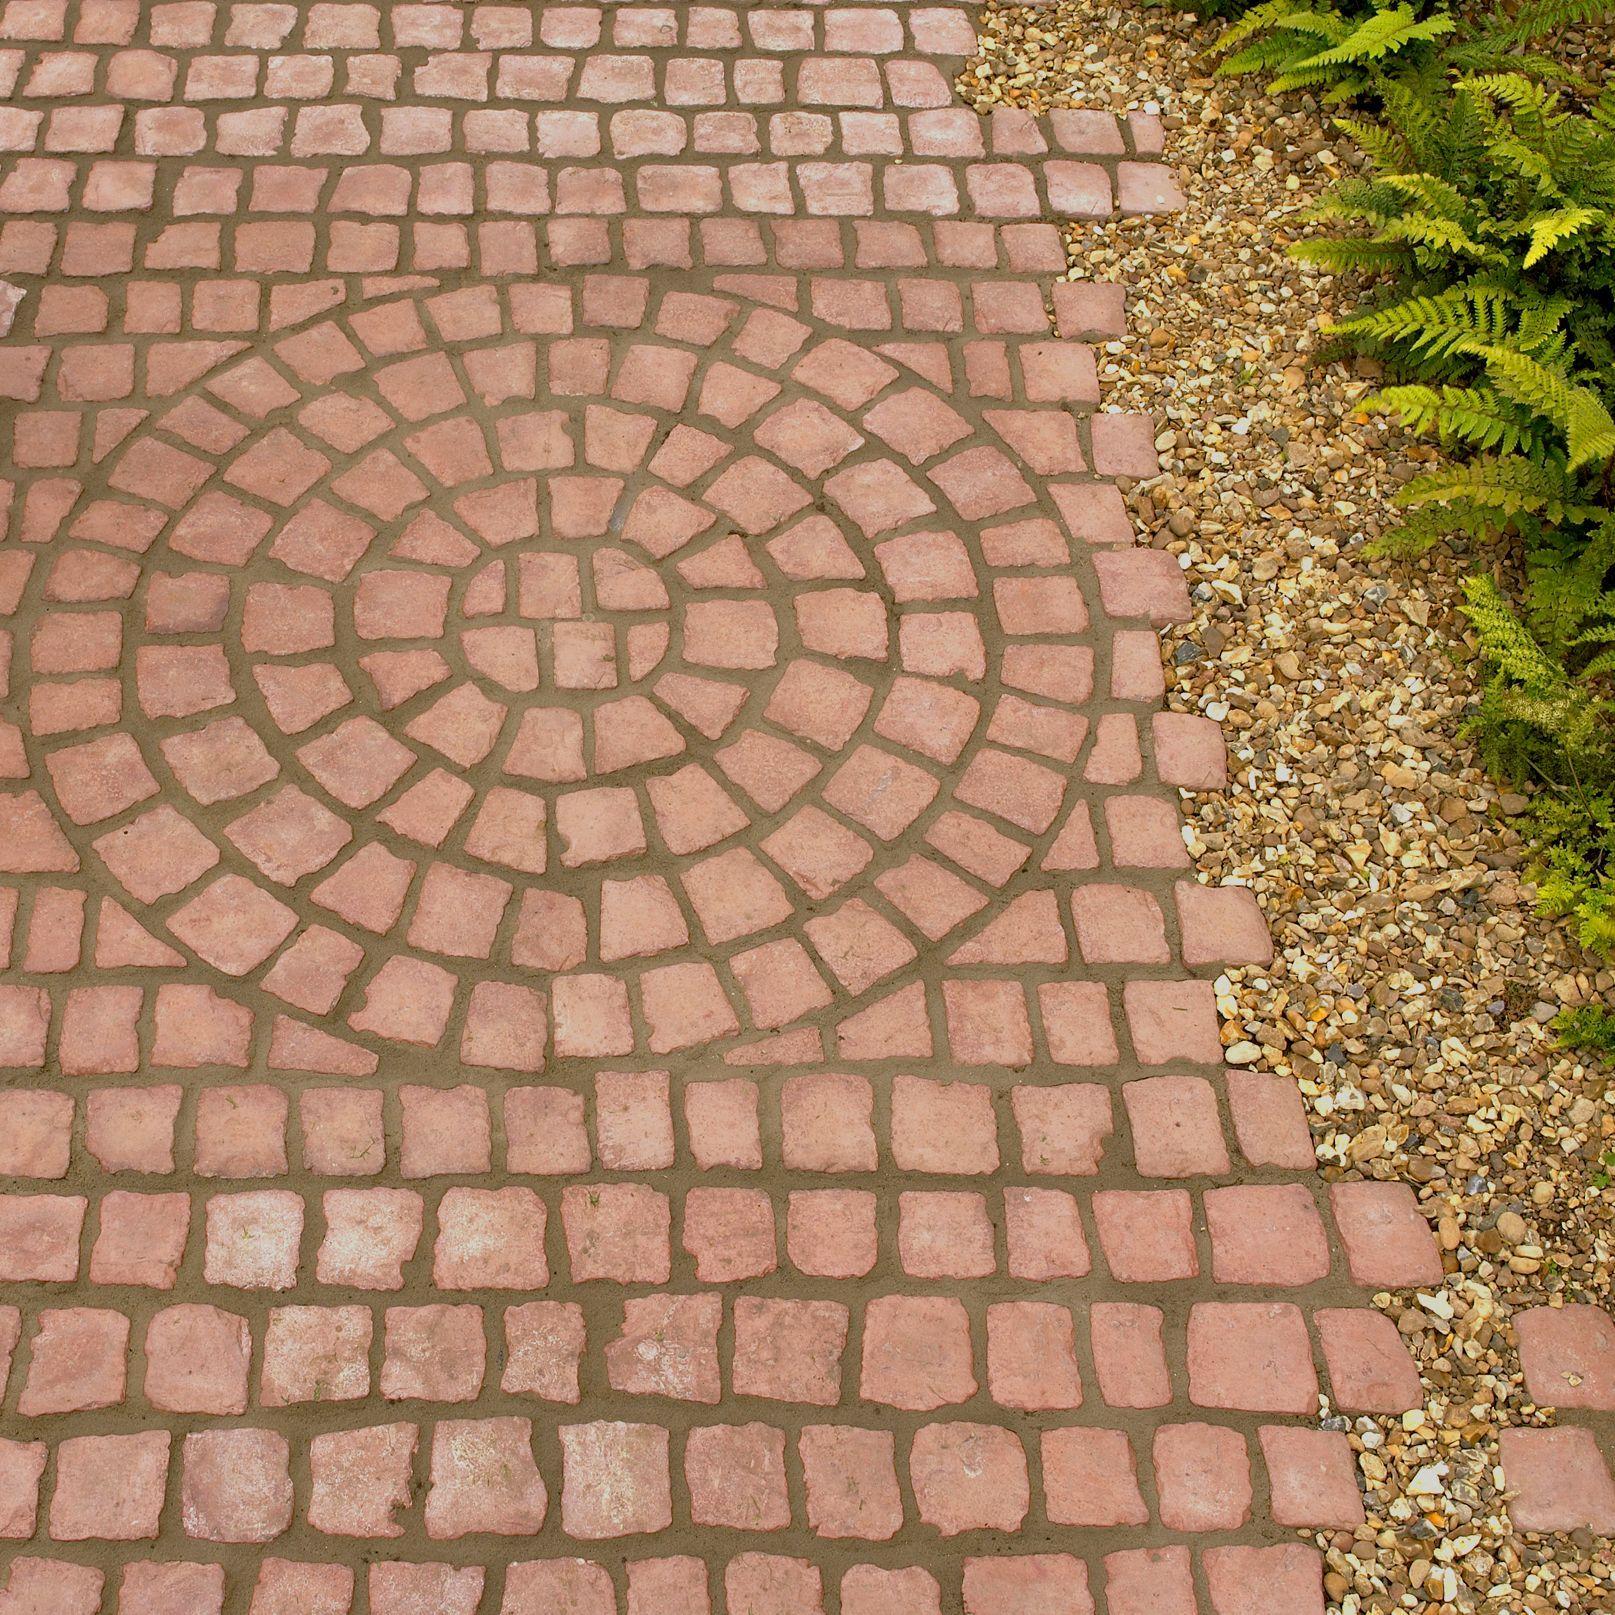 Floor mats b q - Rustic Red Carpet Stones Cobble Mat Straight L 1200mm W 400mm